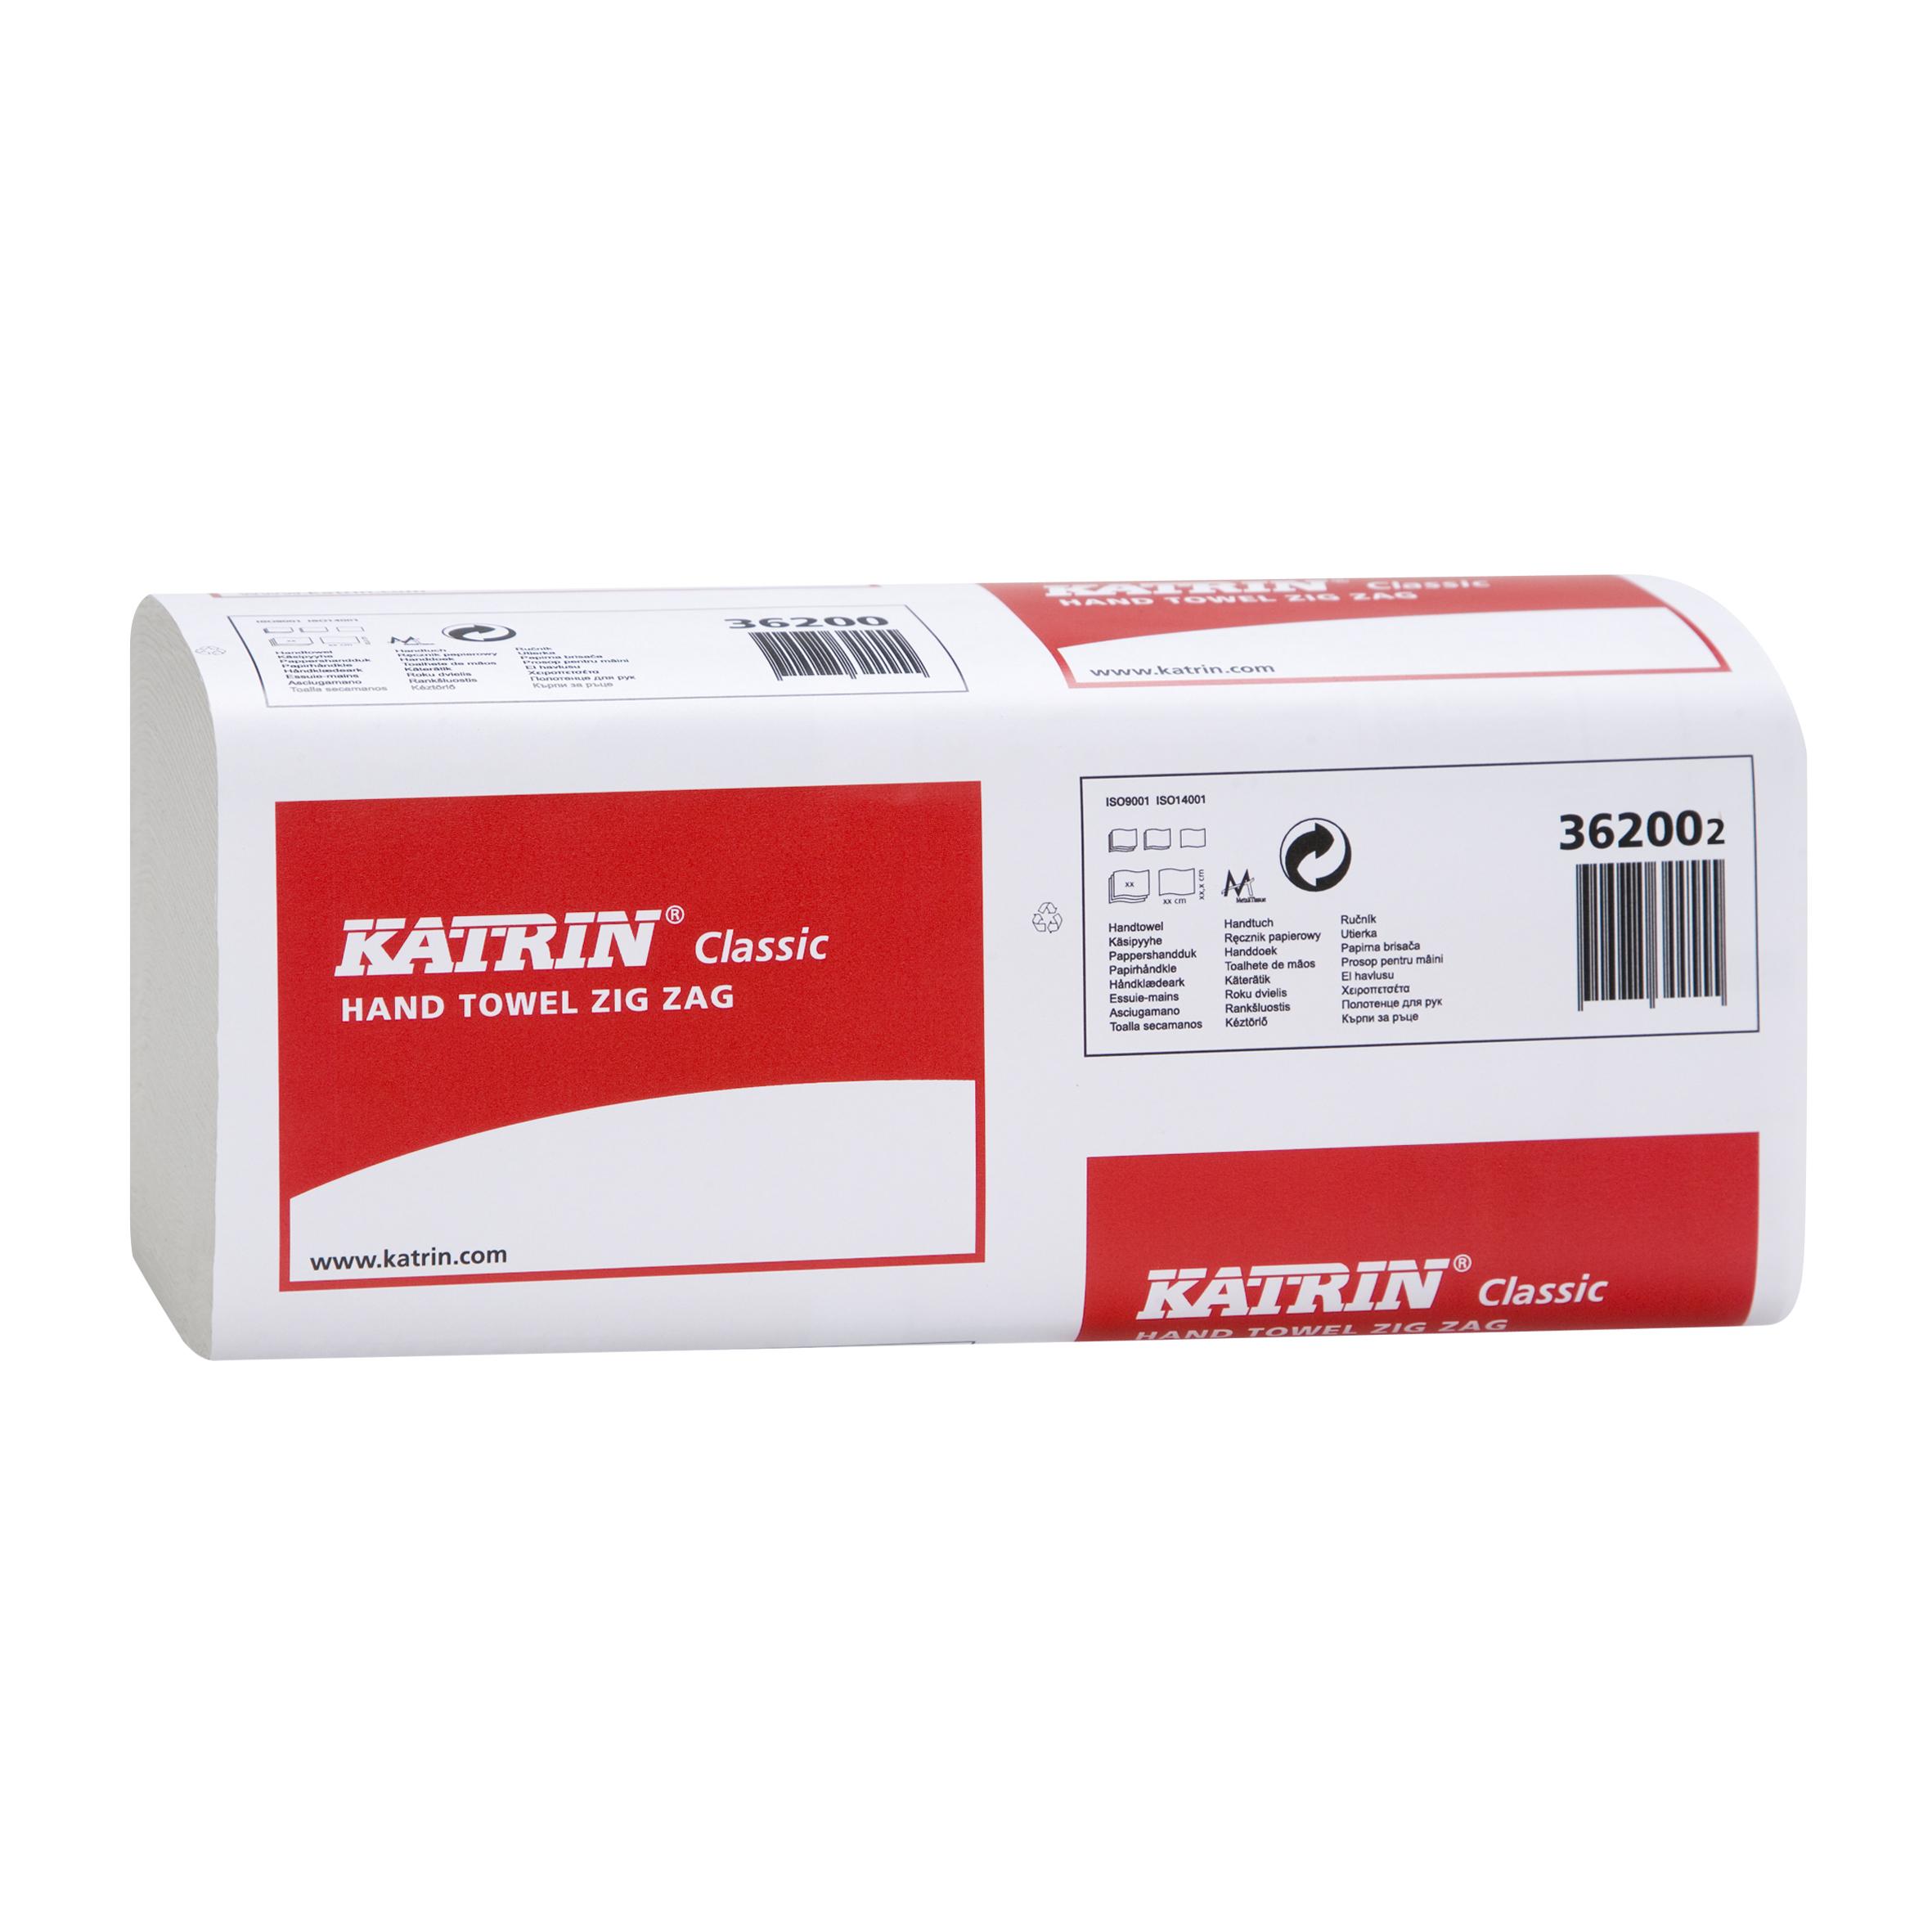 Ručníky Z-Z 200ks 1vr 362002 Katrin bílé